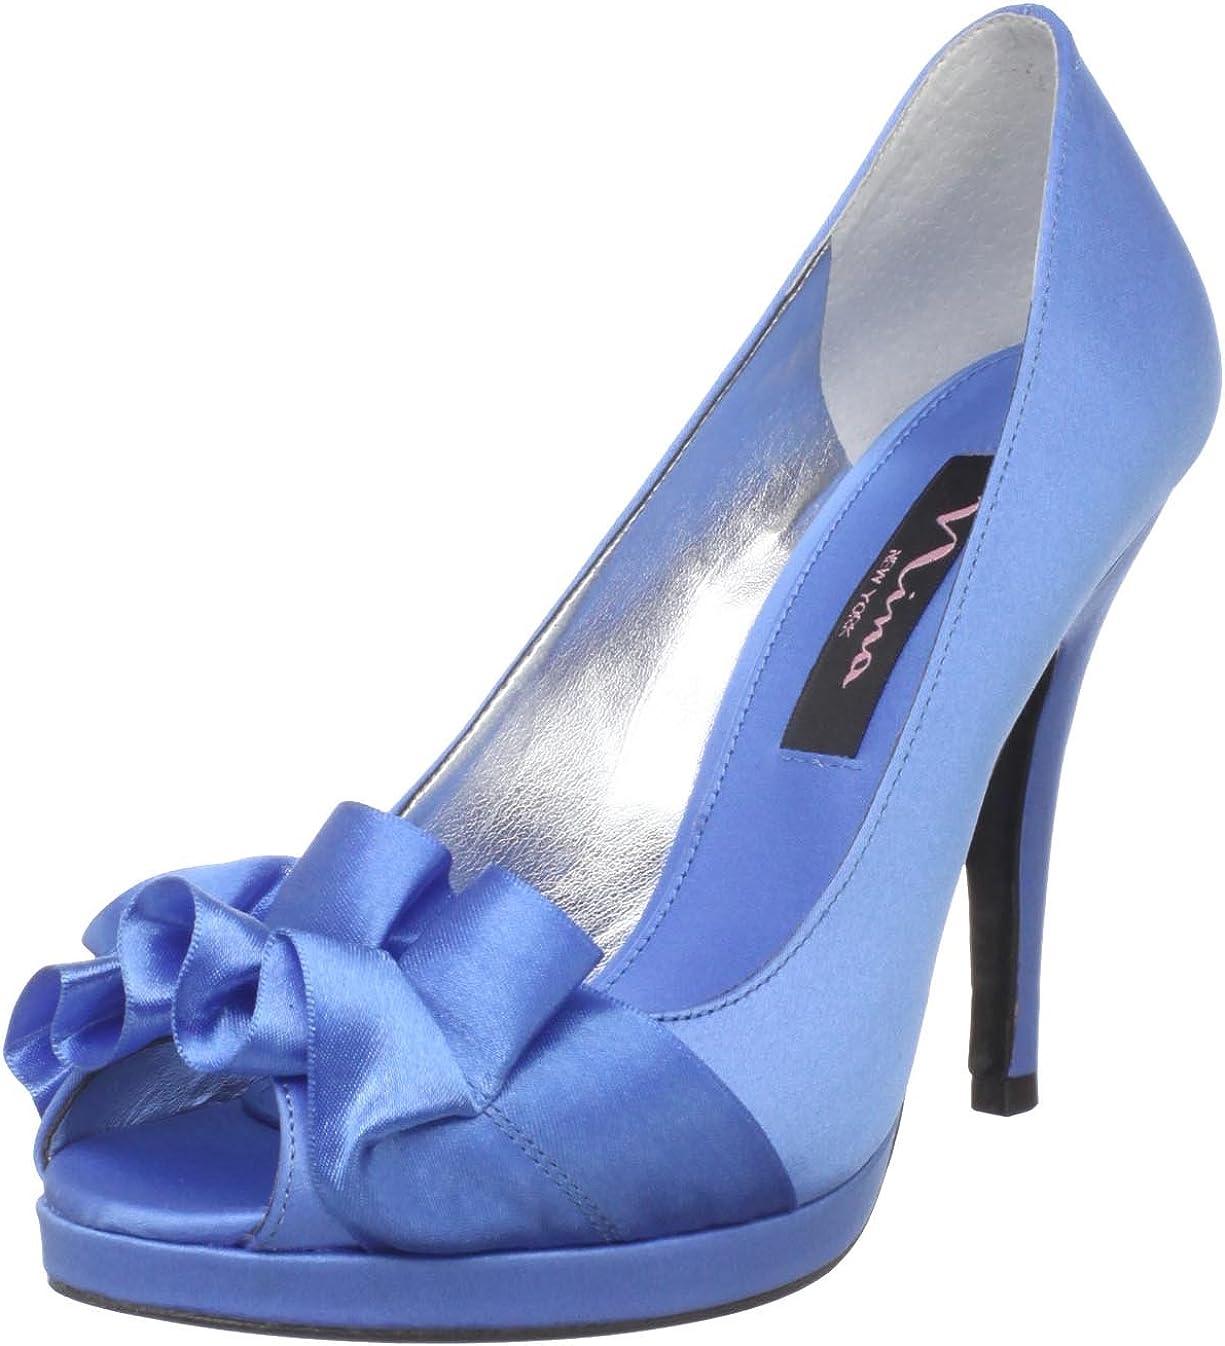 Nina Women's Evelixa Peep-Toe Pump Dealing full price reduction M 2021 spring and summer new US China 6 Blue